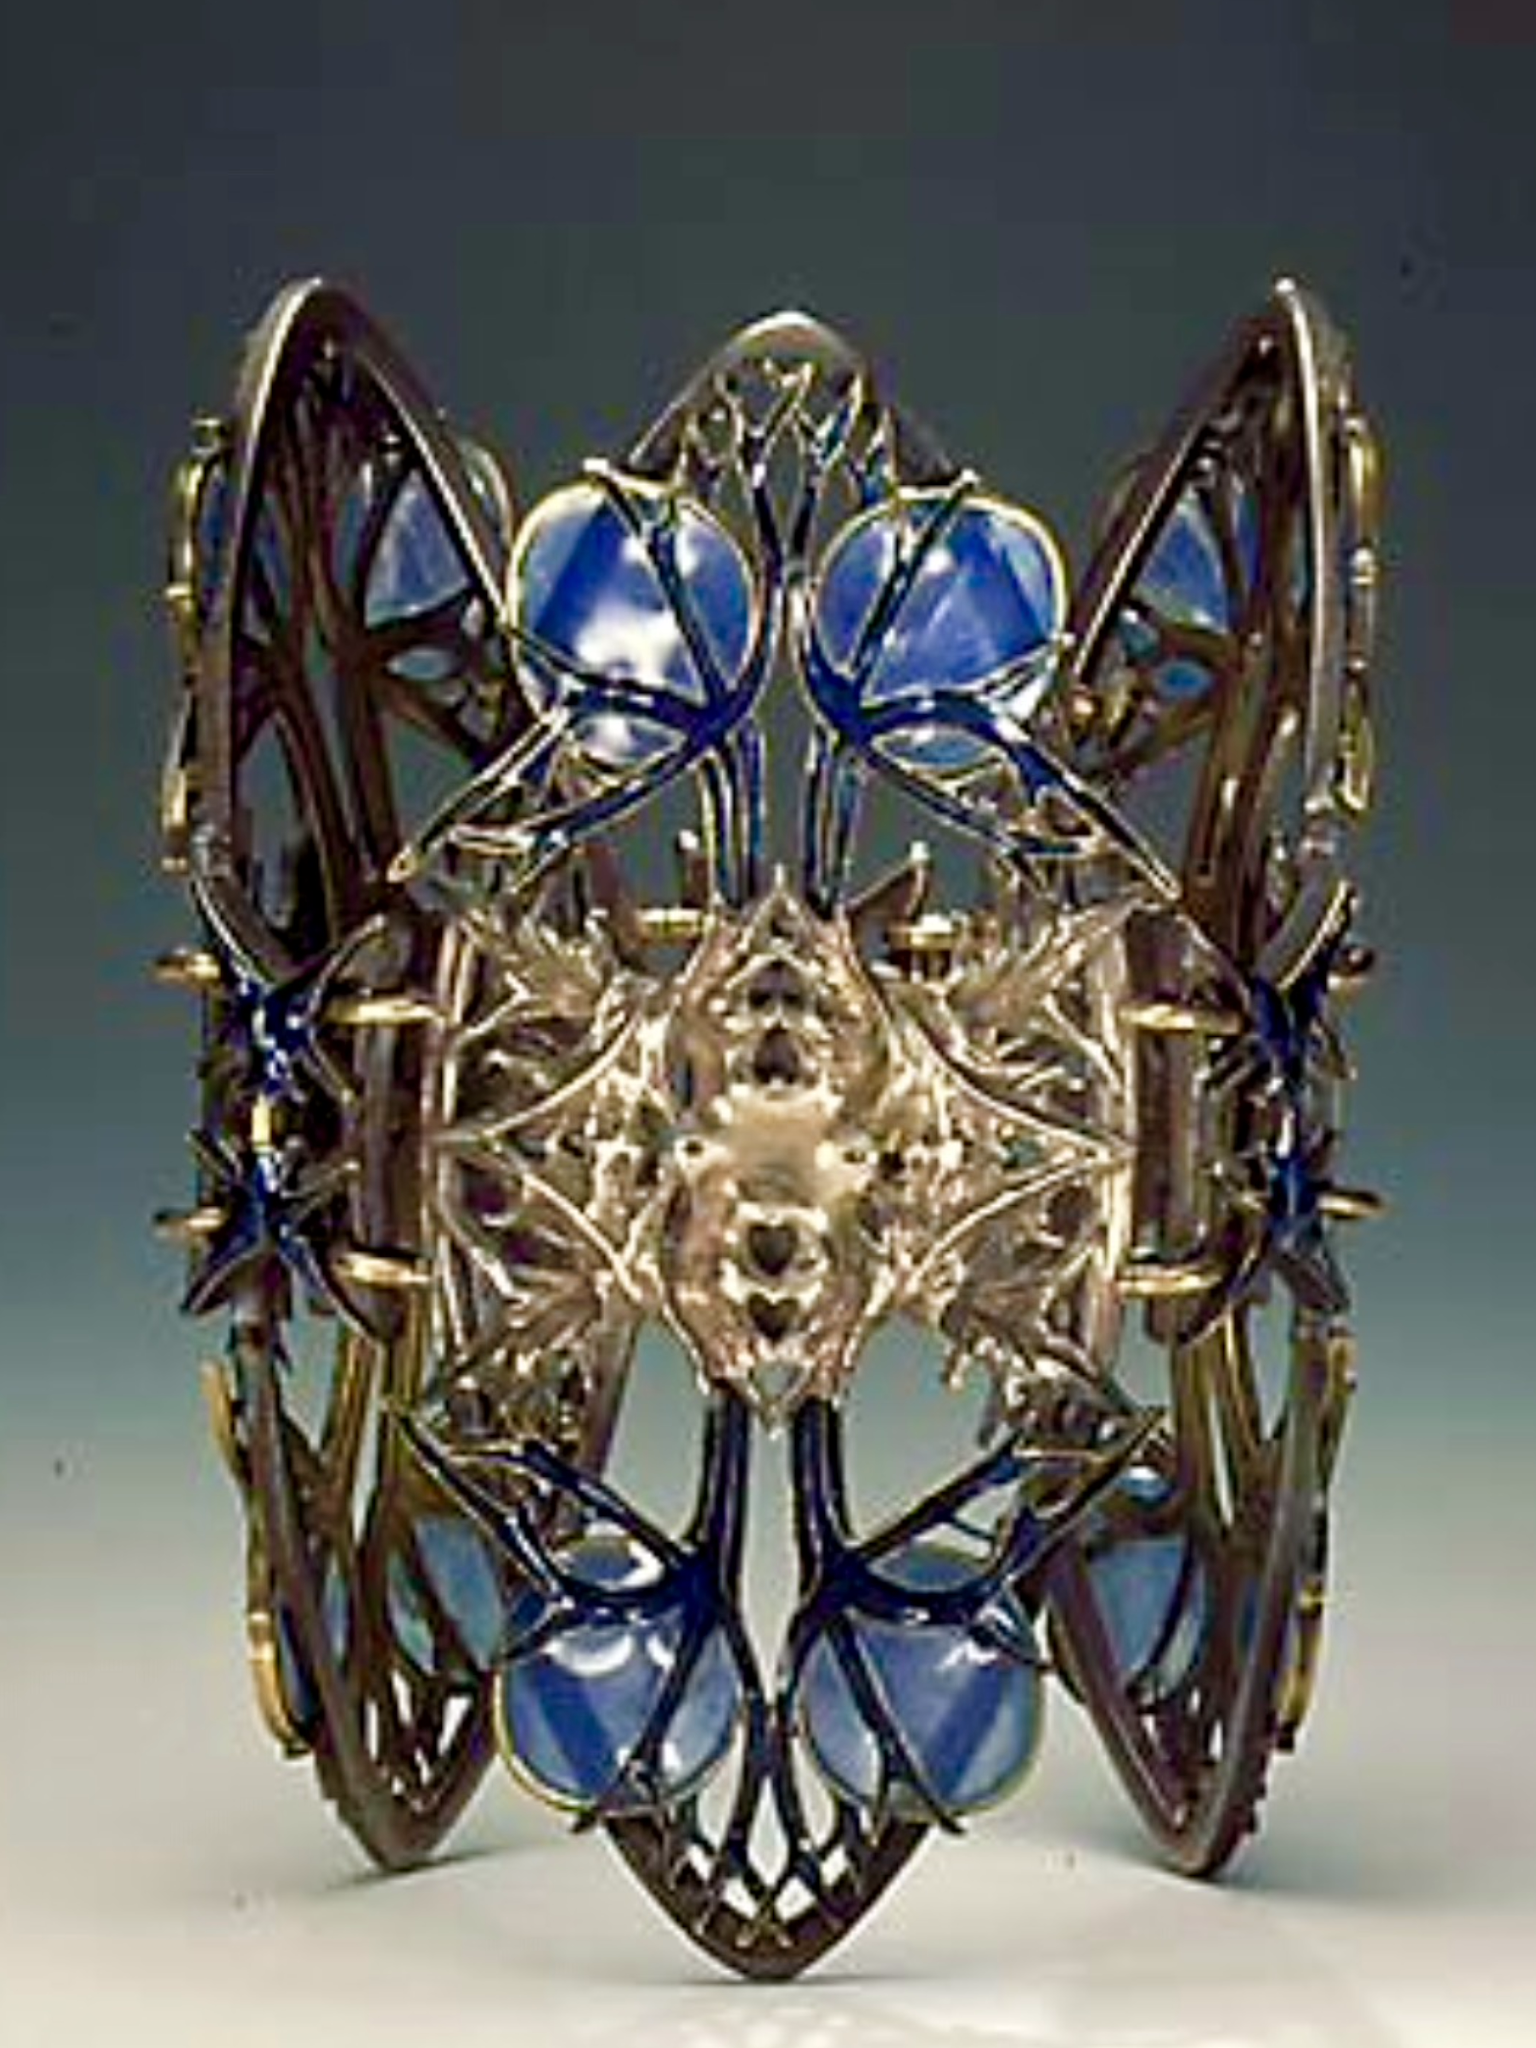 Lalique 1900 Thistle Bracelet: silver/ gold/ enamel - liveinternet.ru